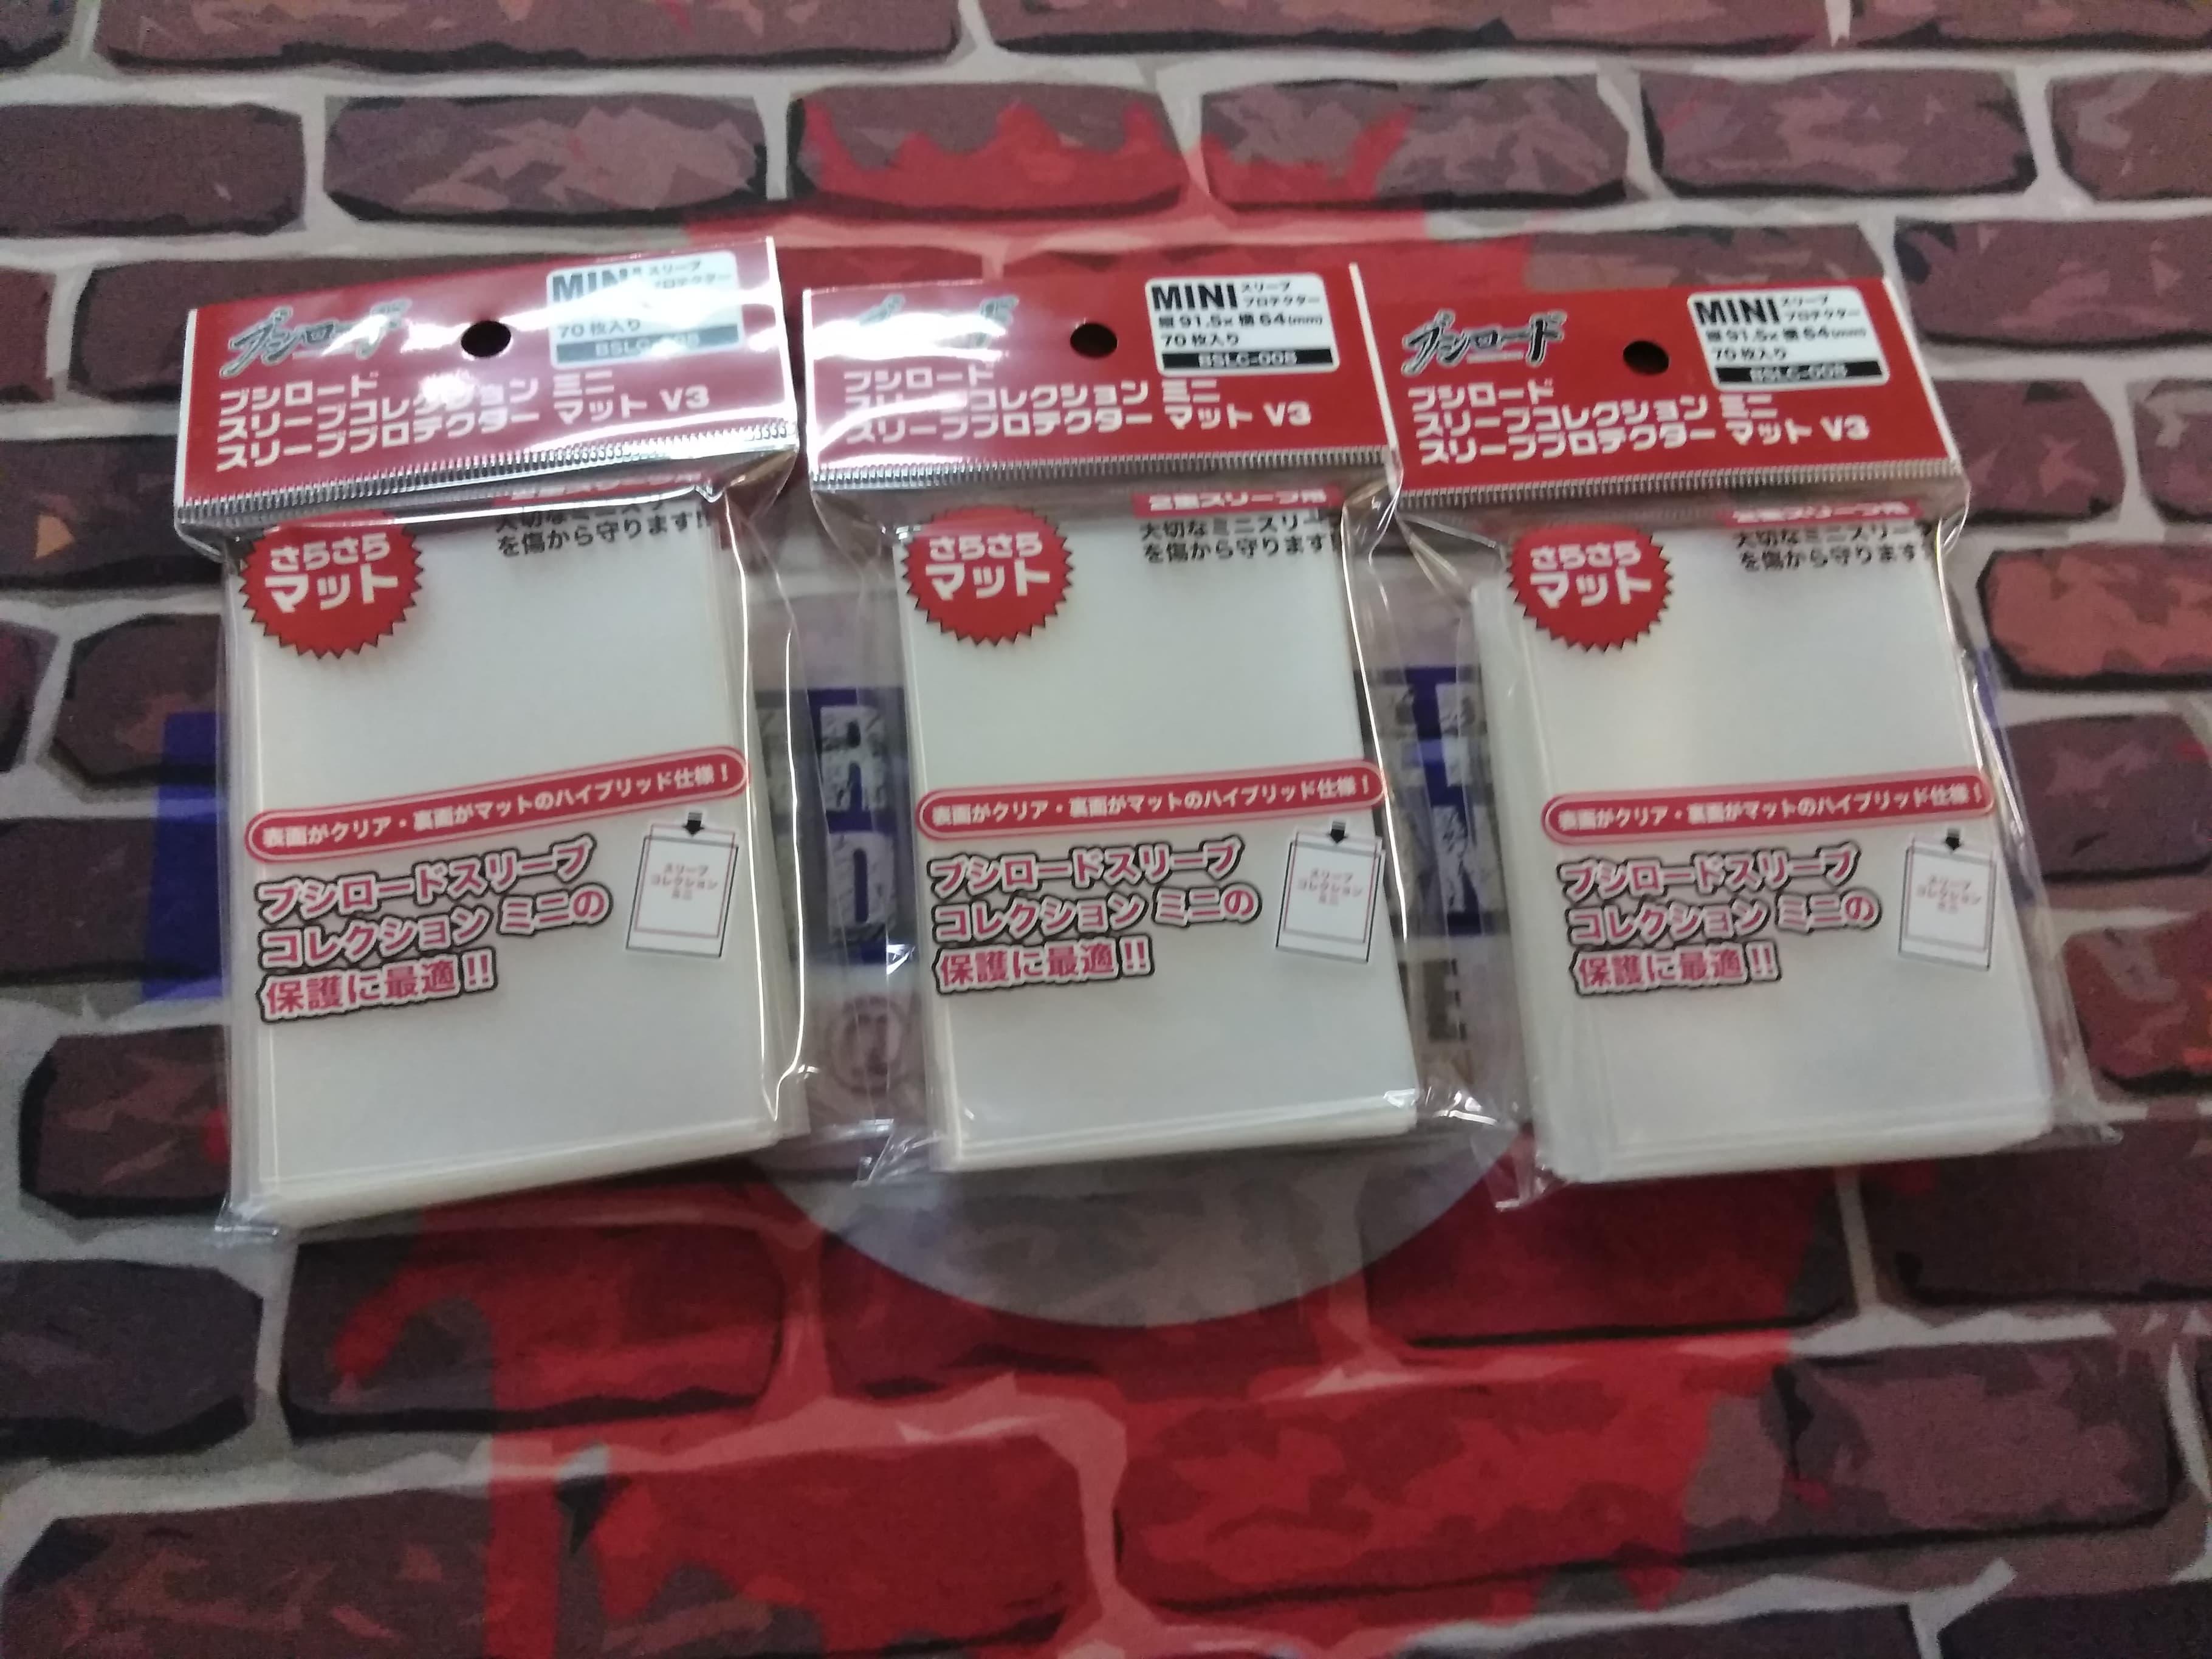 Bushiroad Mini Size Oversleeves (Matte) BSLC-008 (3 - Pack)